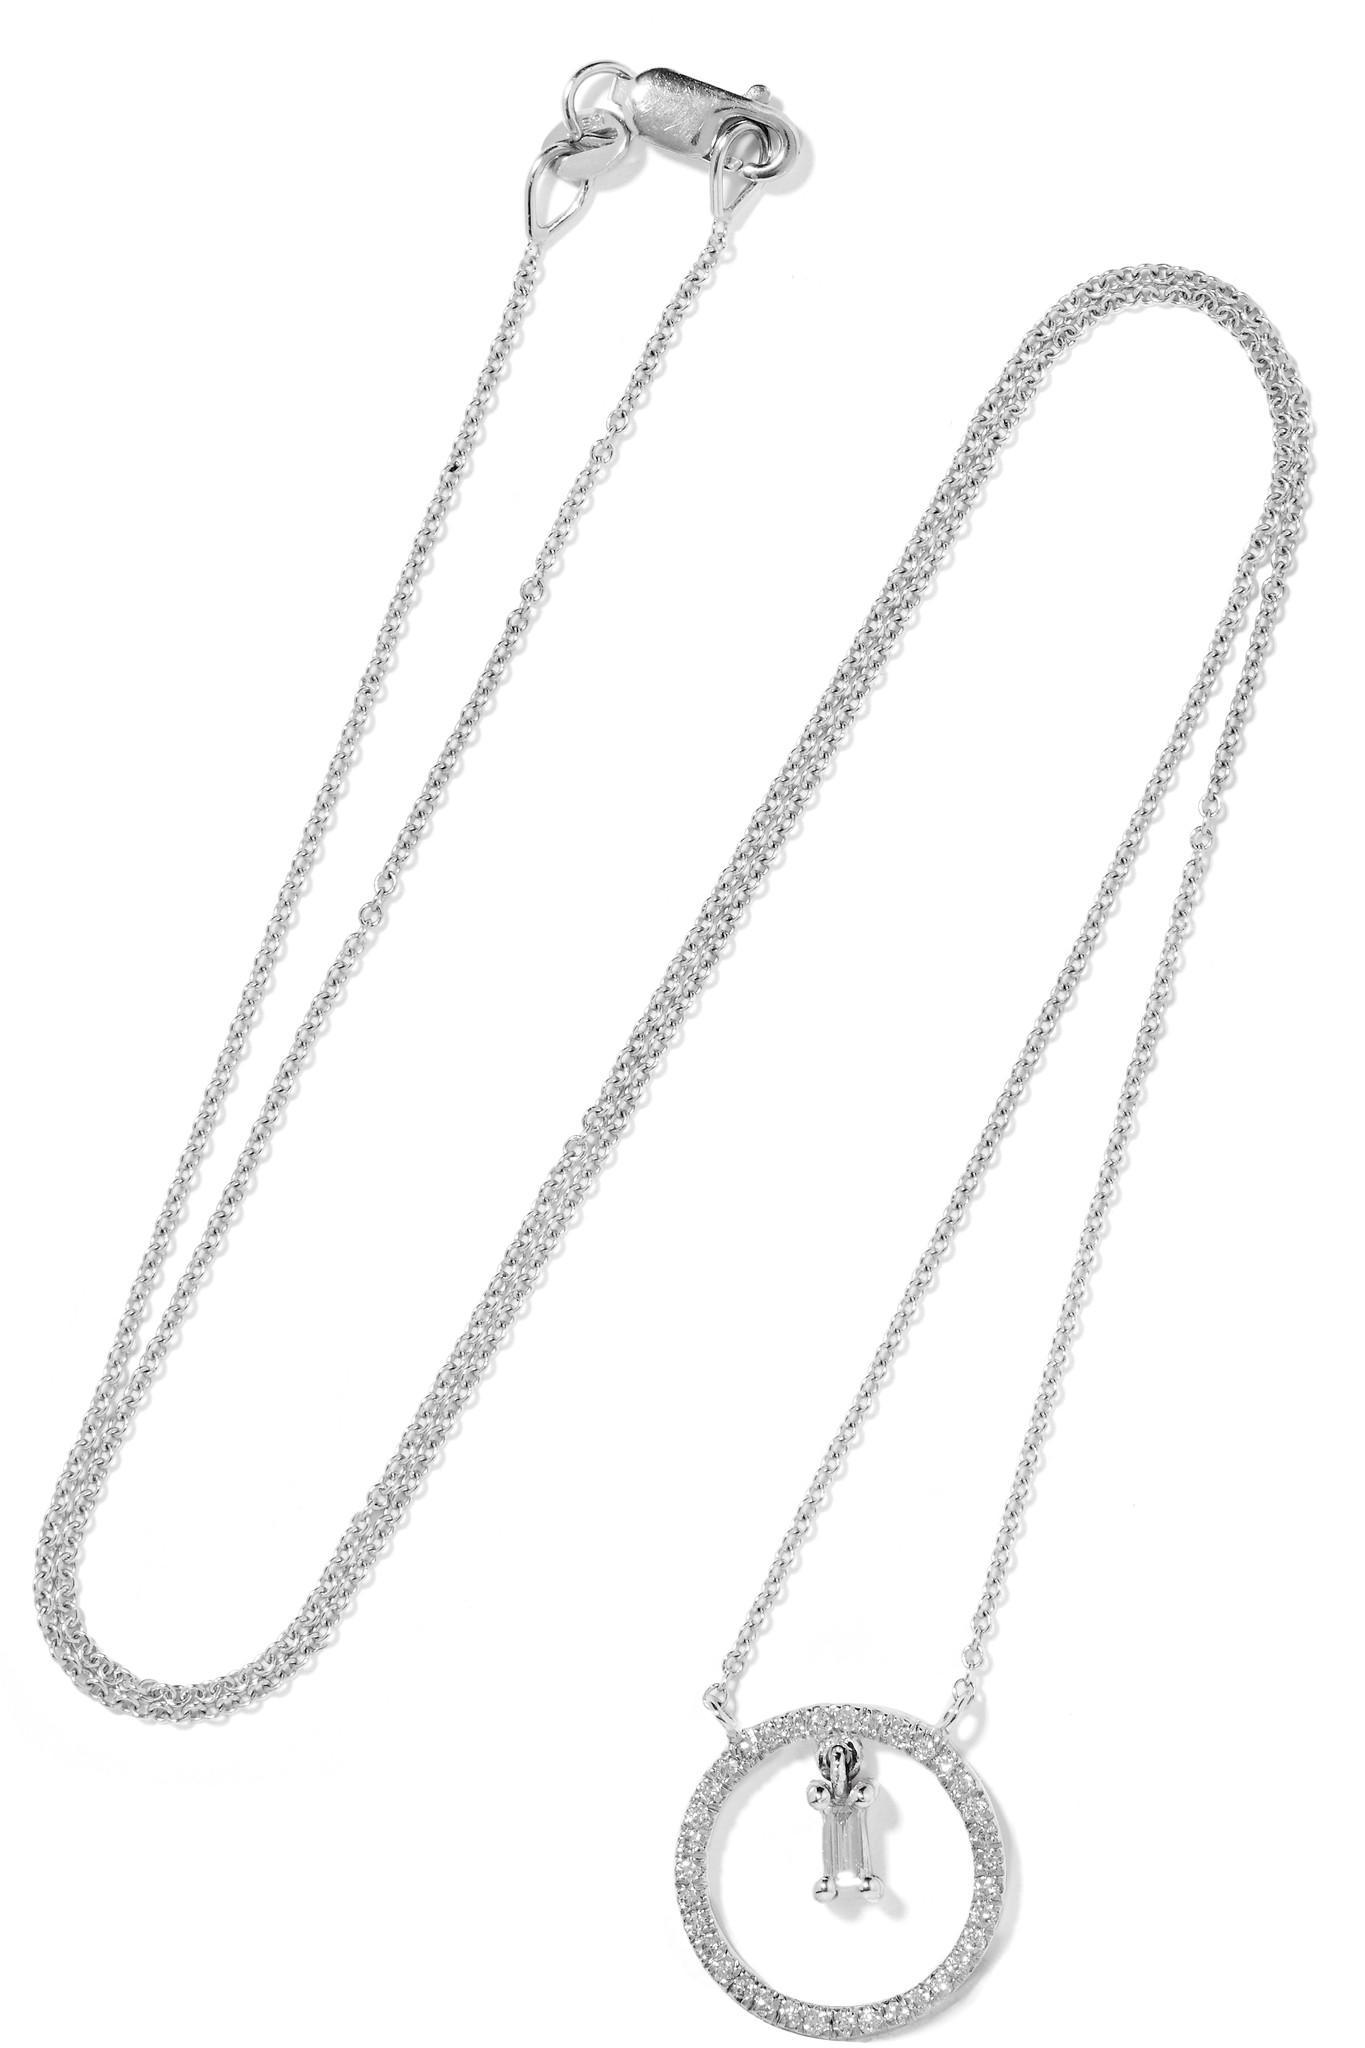 Ileana Makri Mini Cross 18-karat White Gold Diamond Necklace FUPXNg